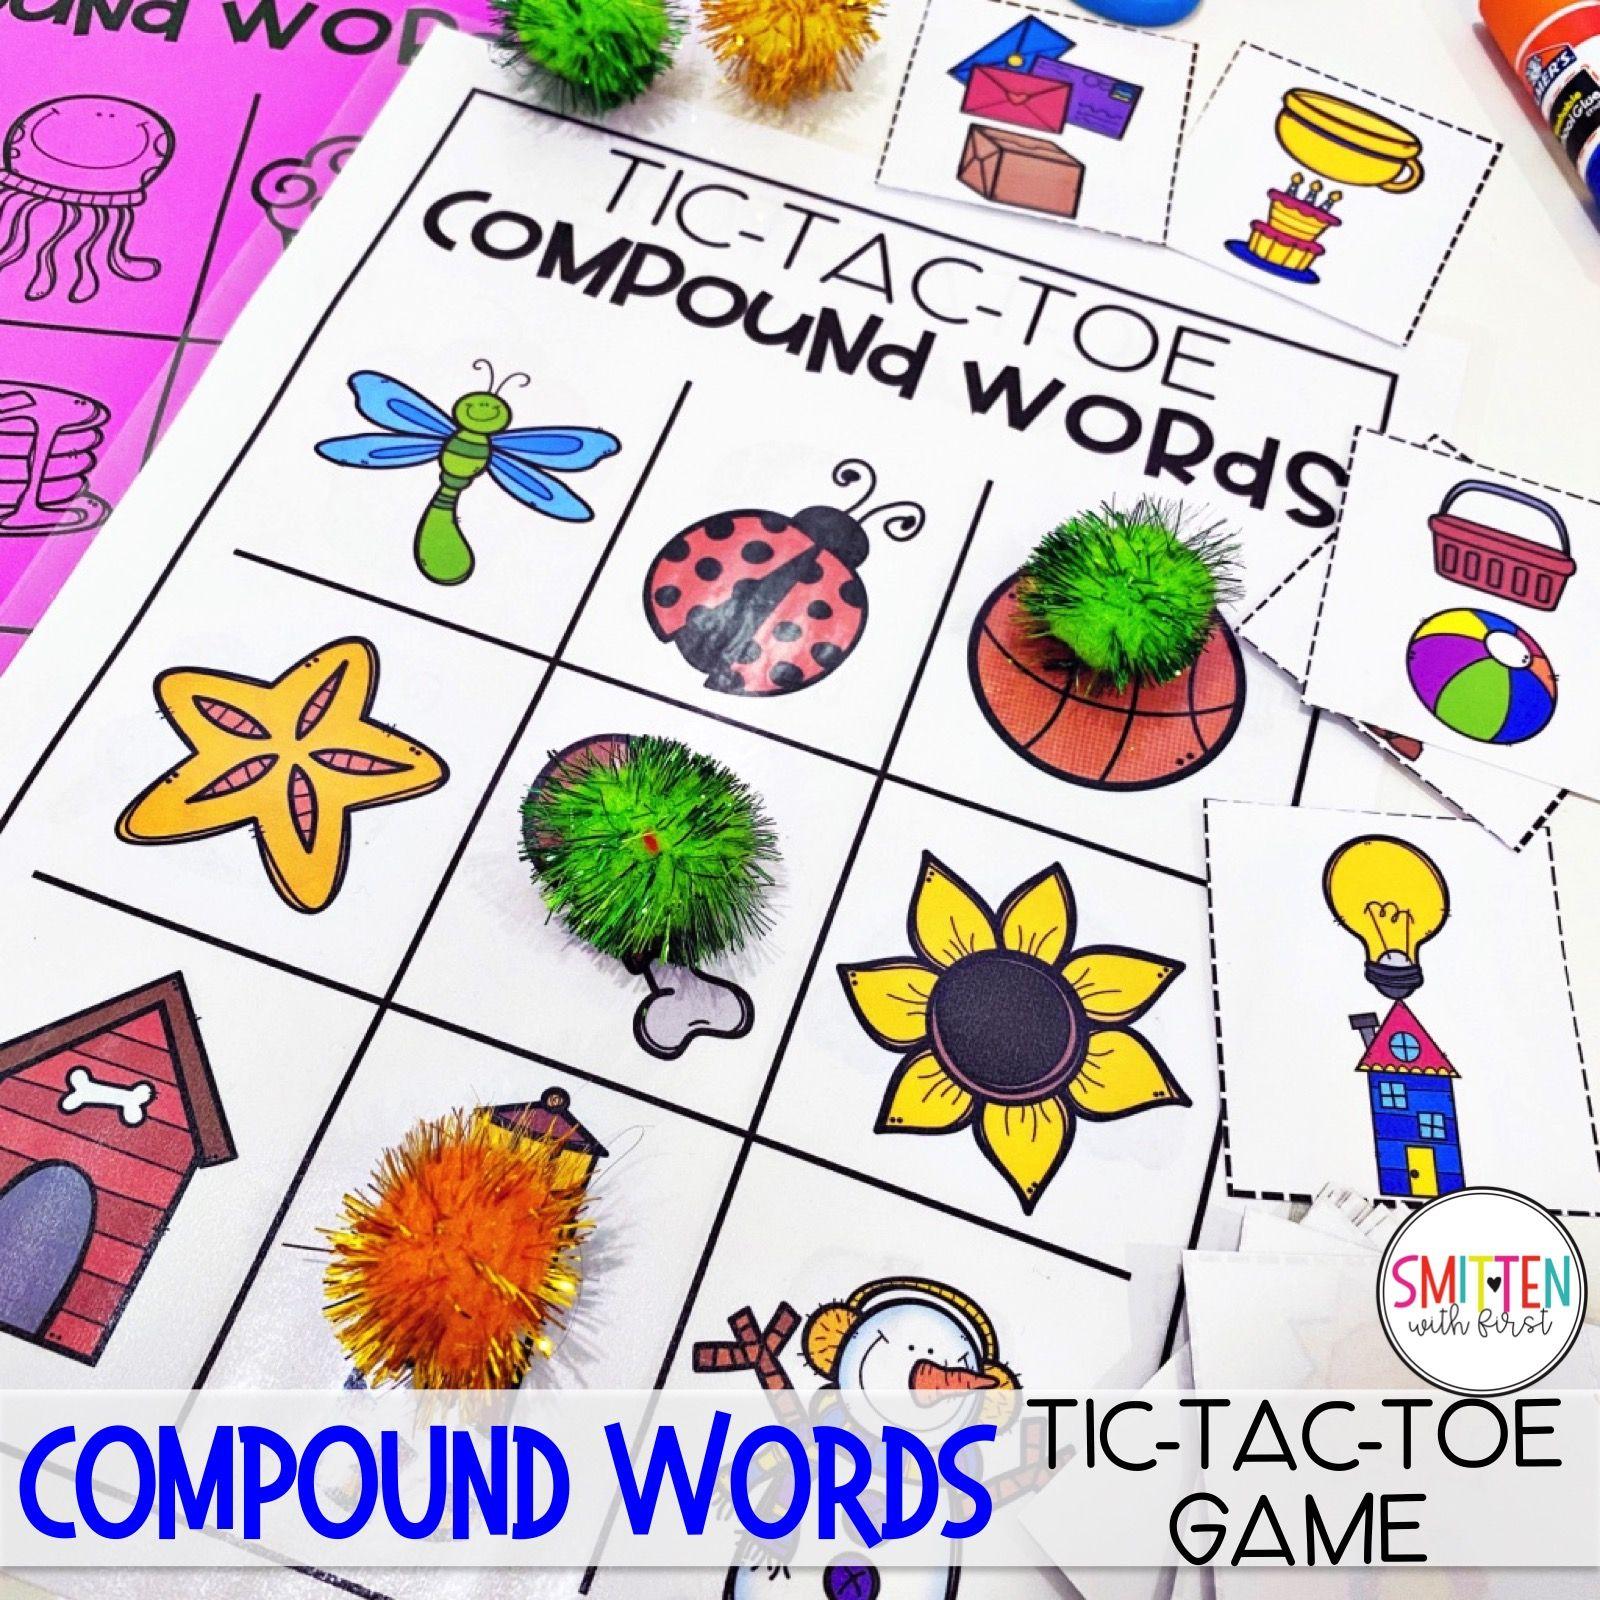 Compound Words Activities For Kindergarten 1st Grade And